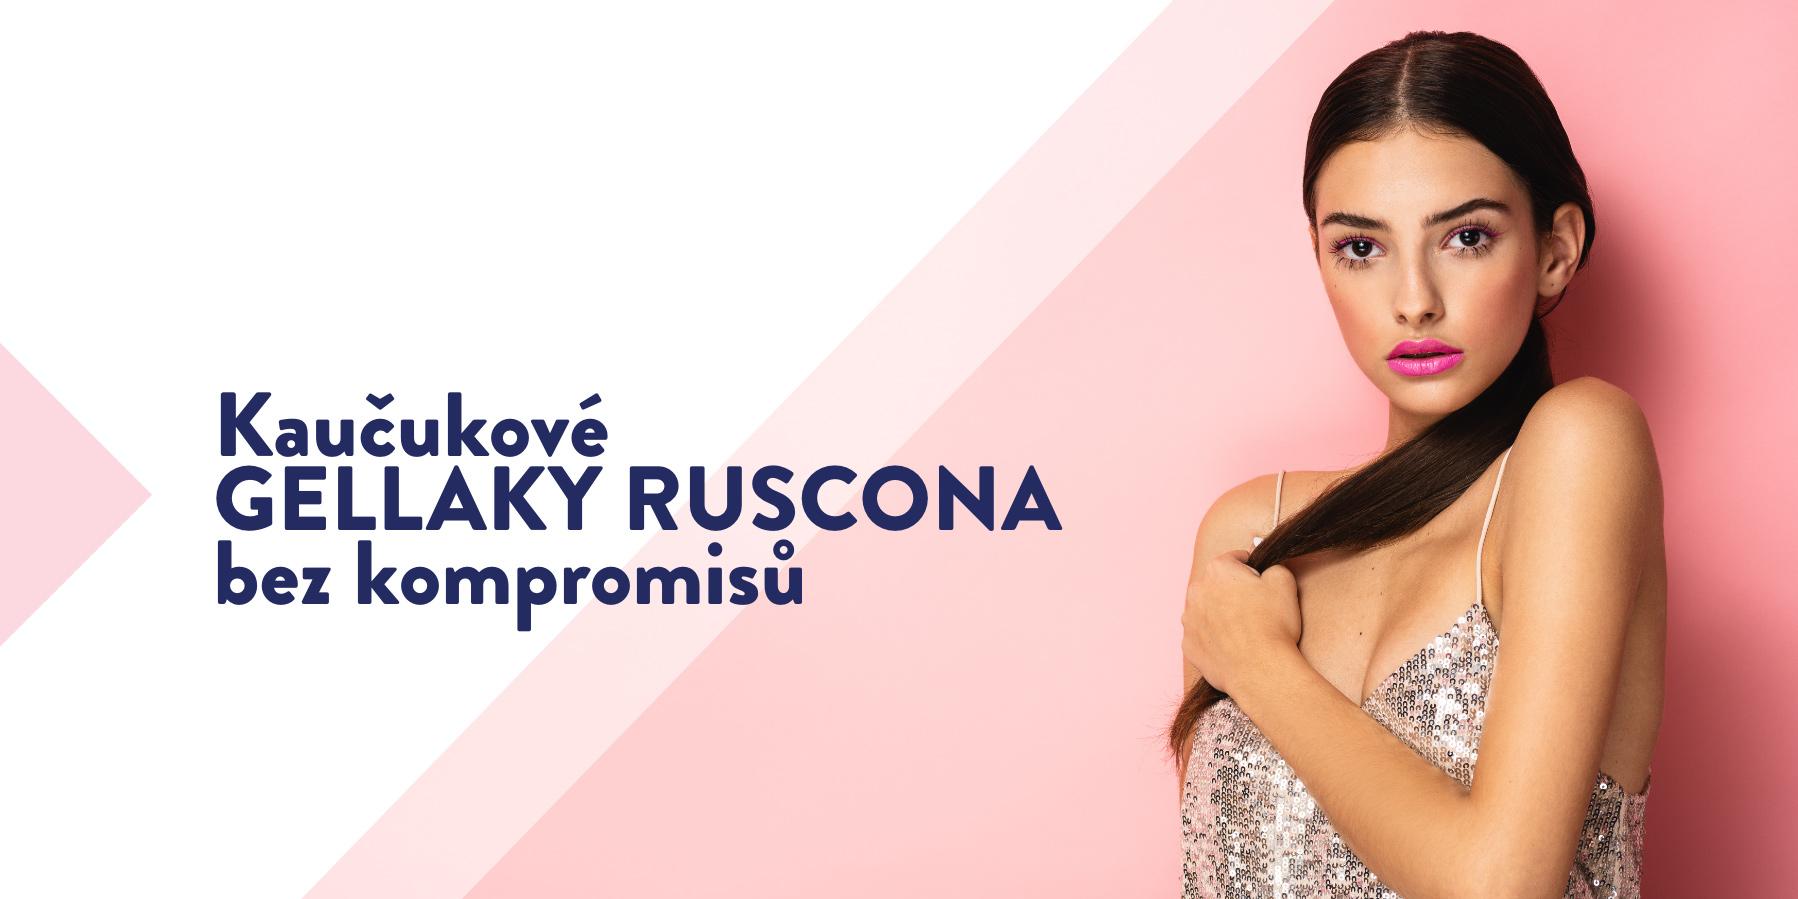 Gellaky-RUSCONA-bez-kompromisu